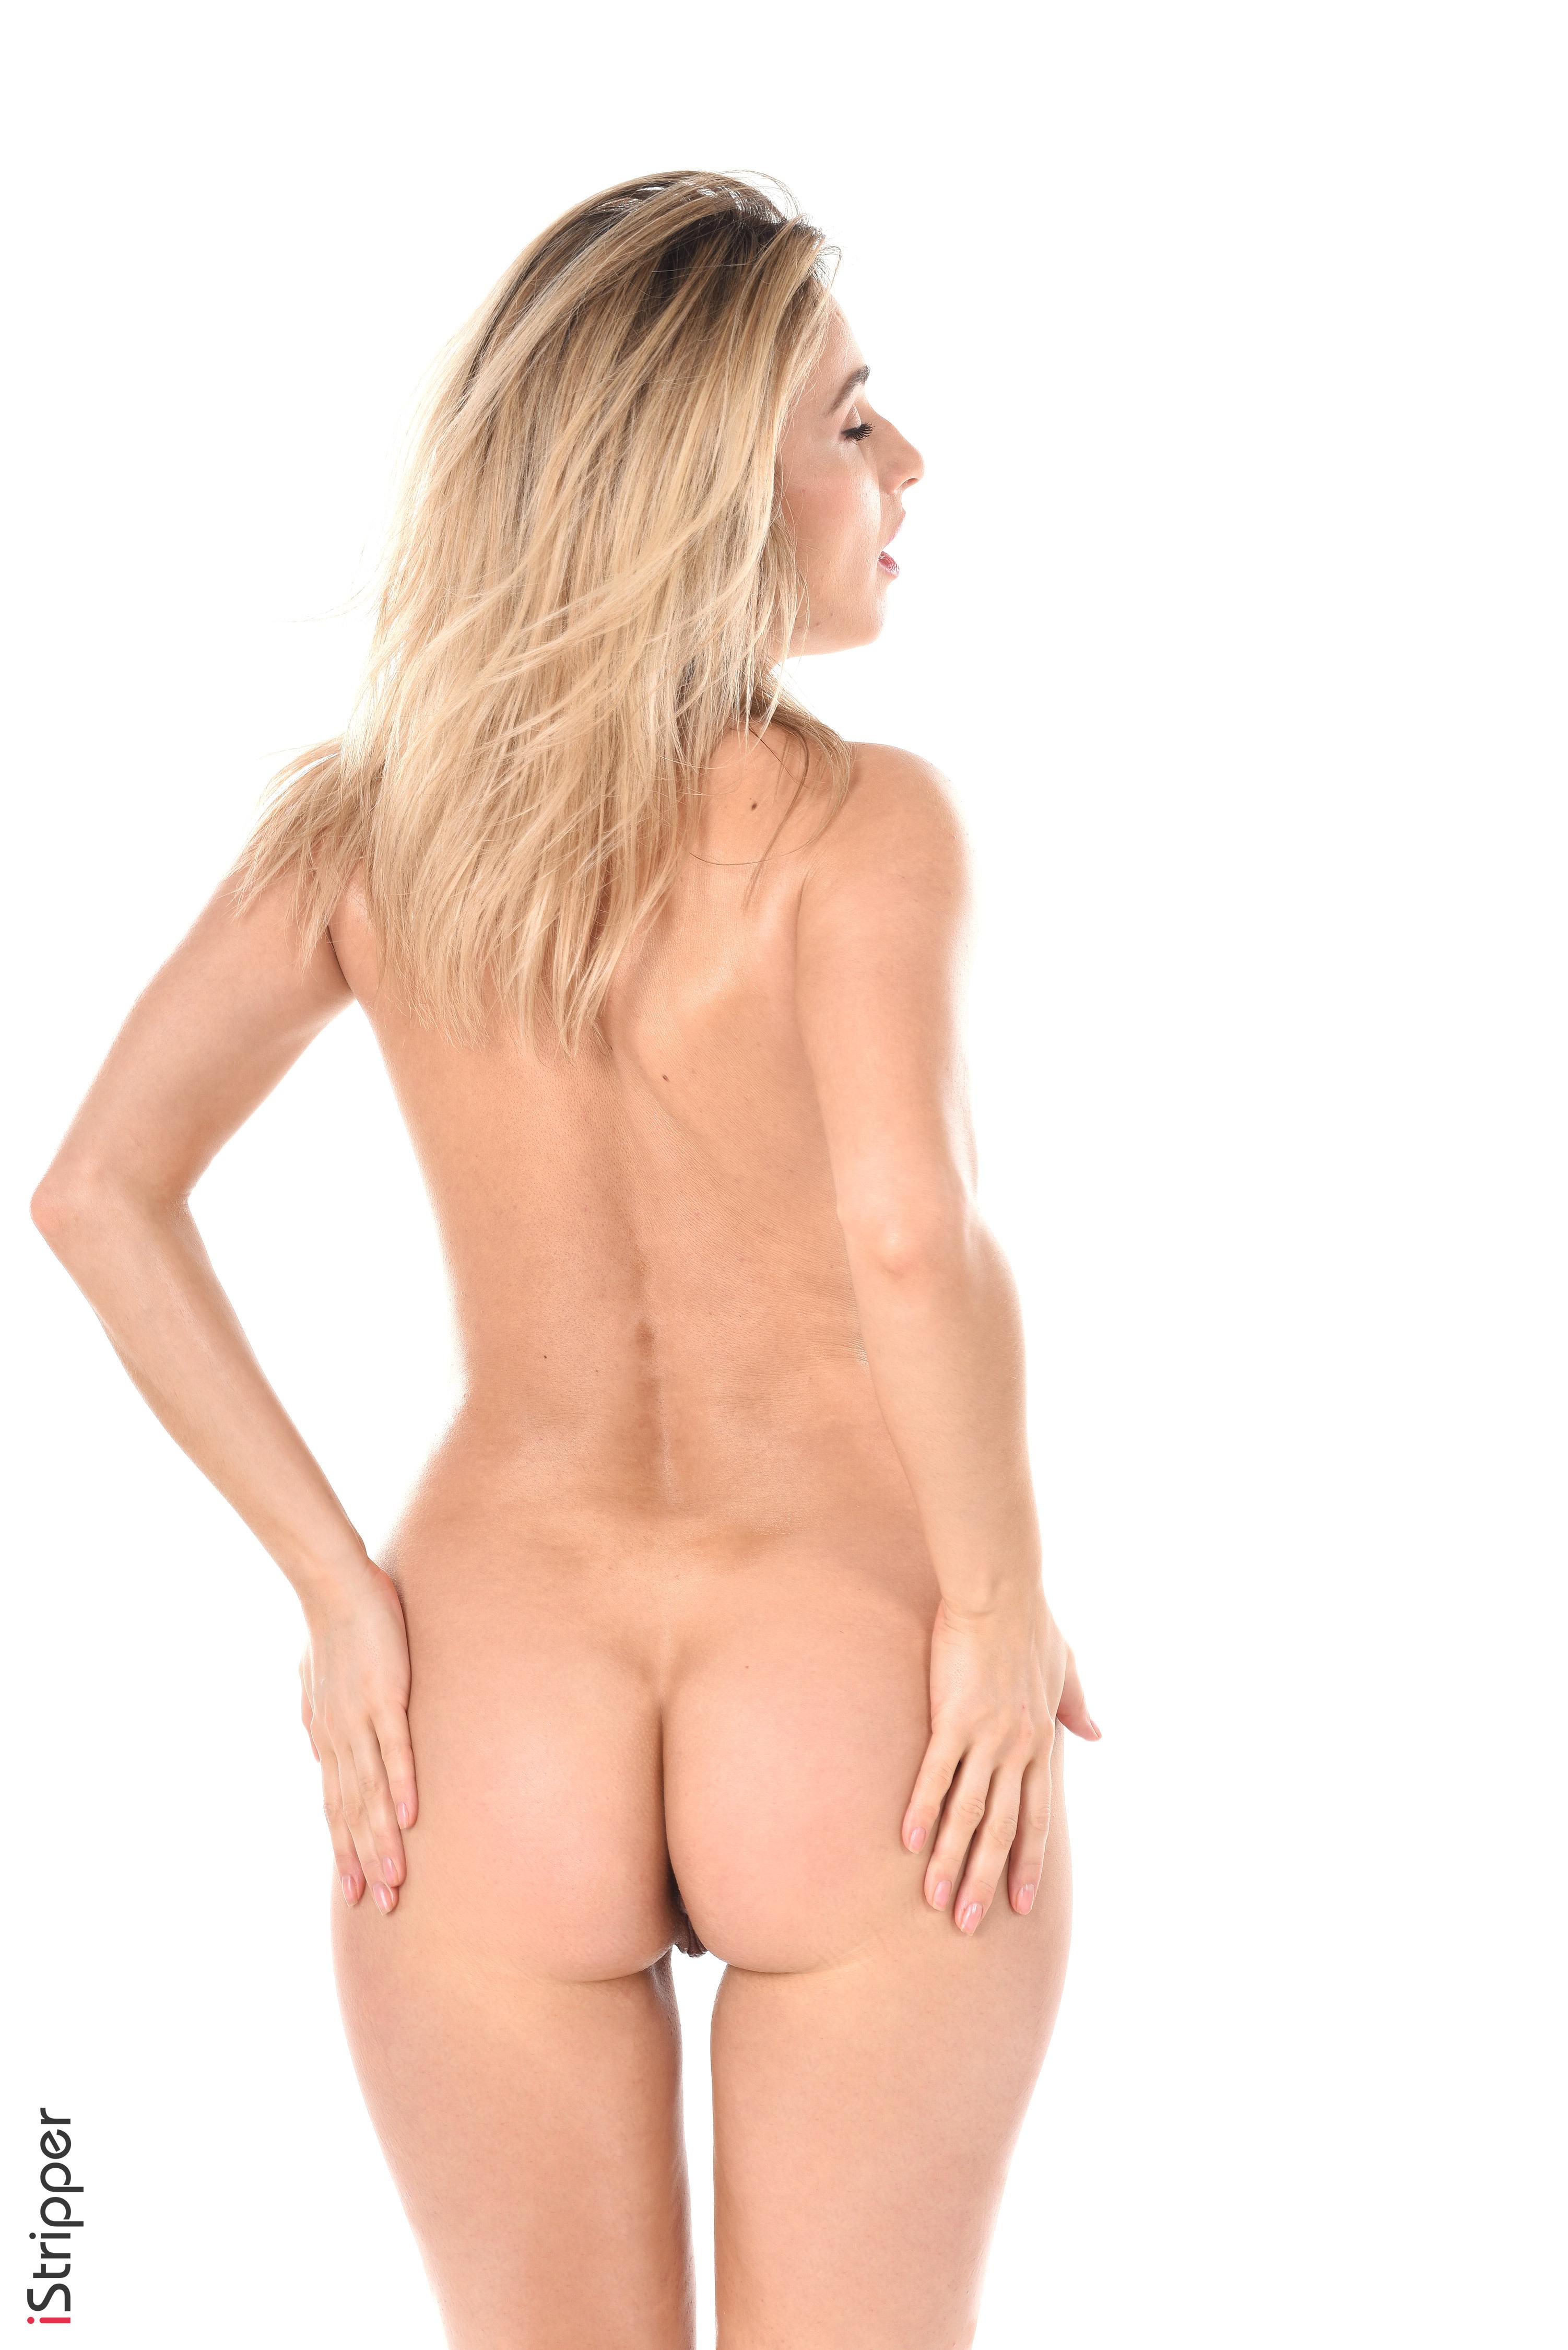 nude girl live wallpaper